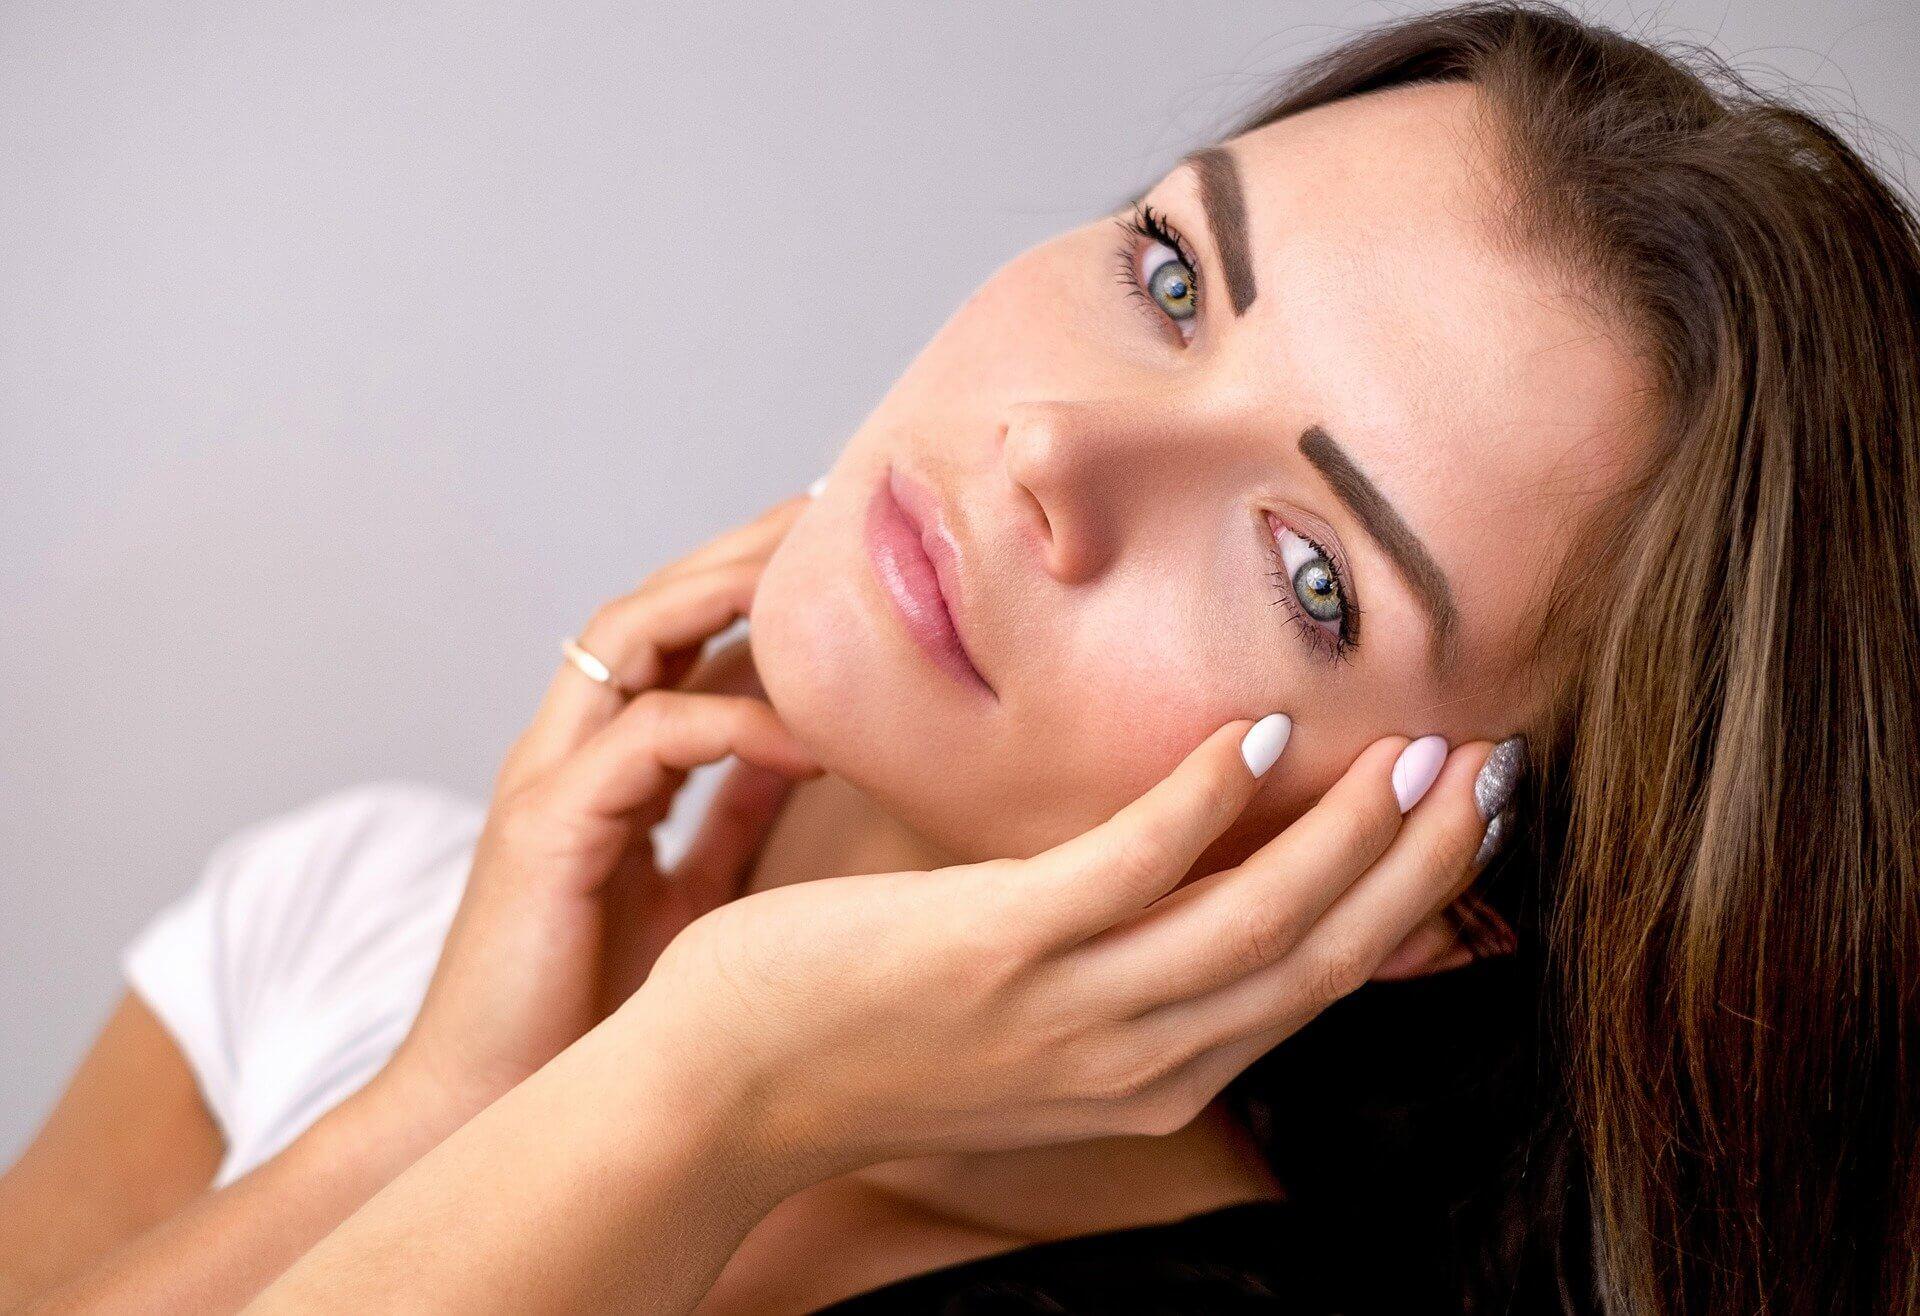 Healthy skin of woman